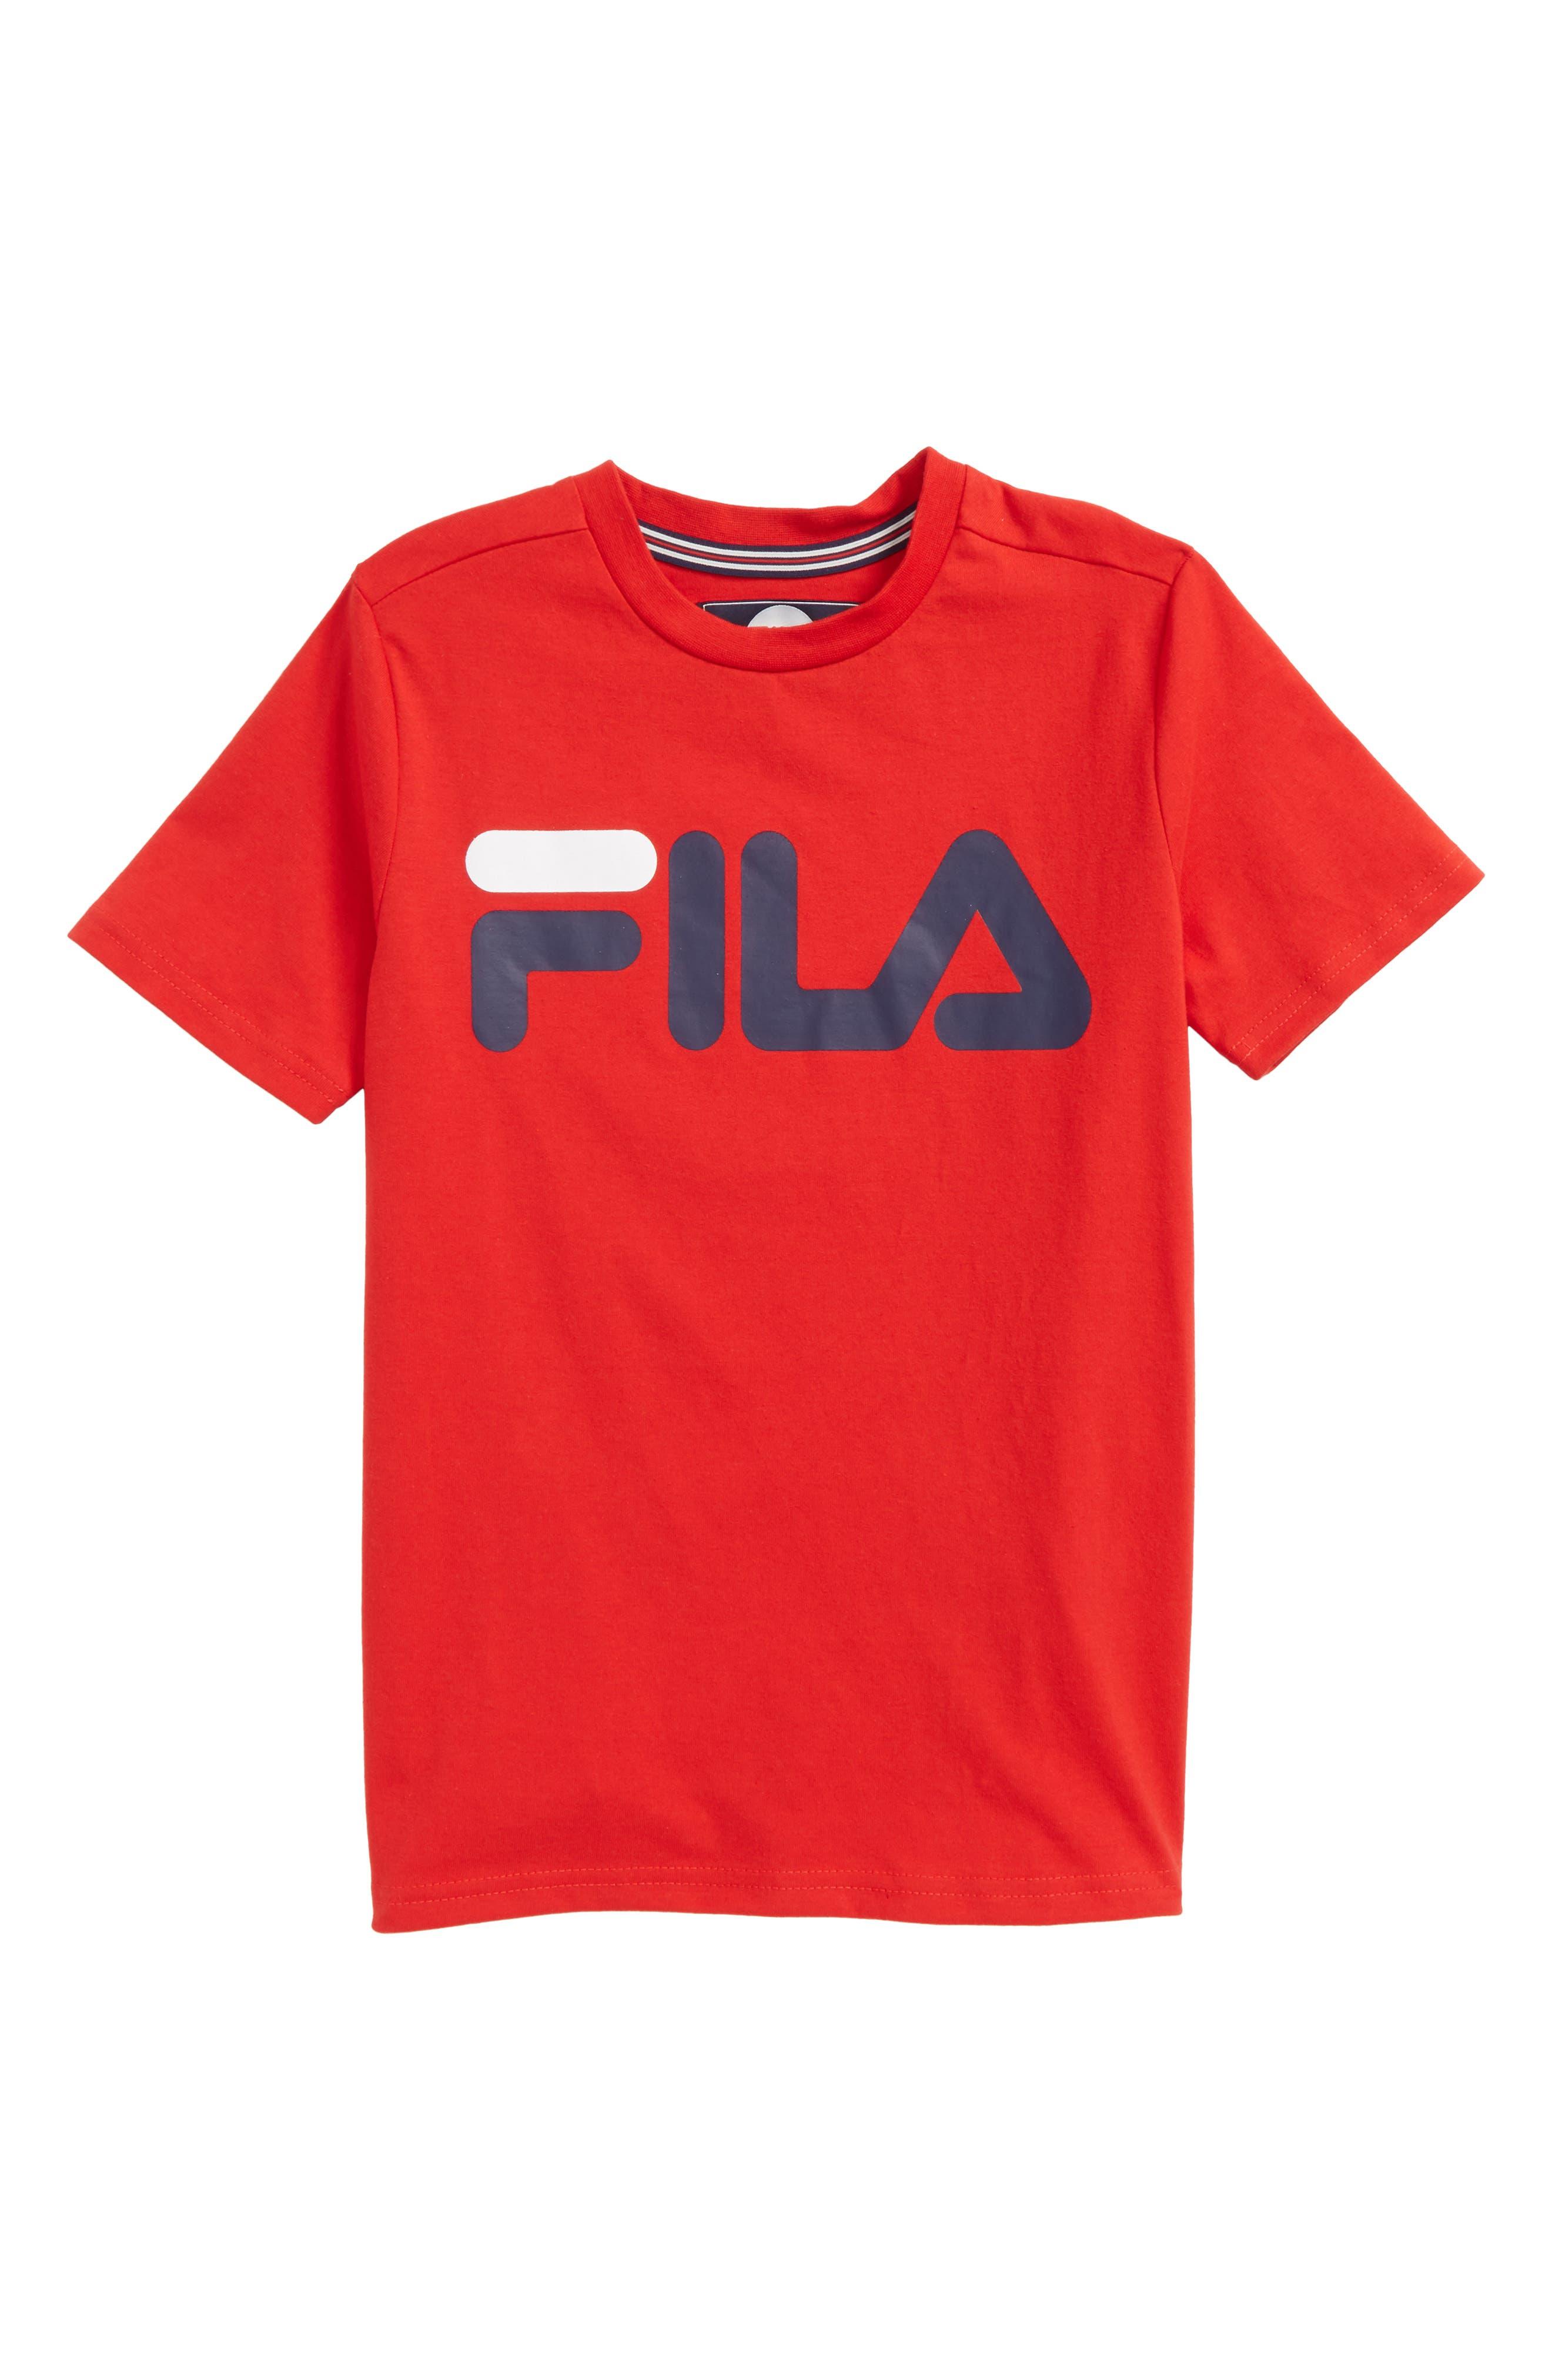 Alternate Image 1 Selected - FILA Classic Logo T-Shirt (Big Boys)